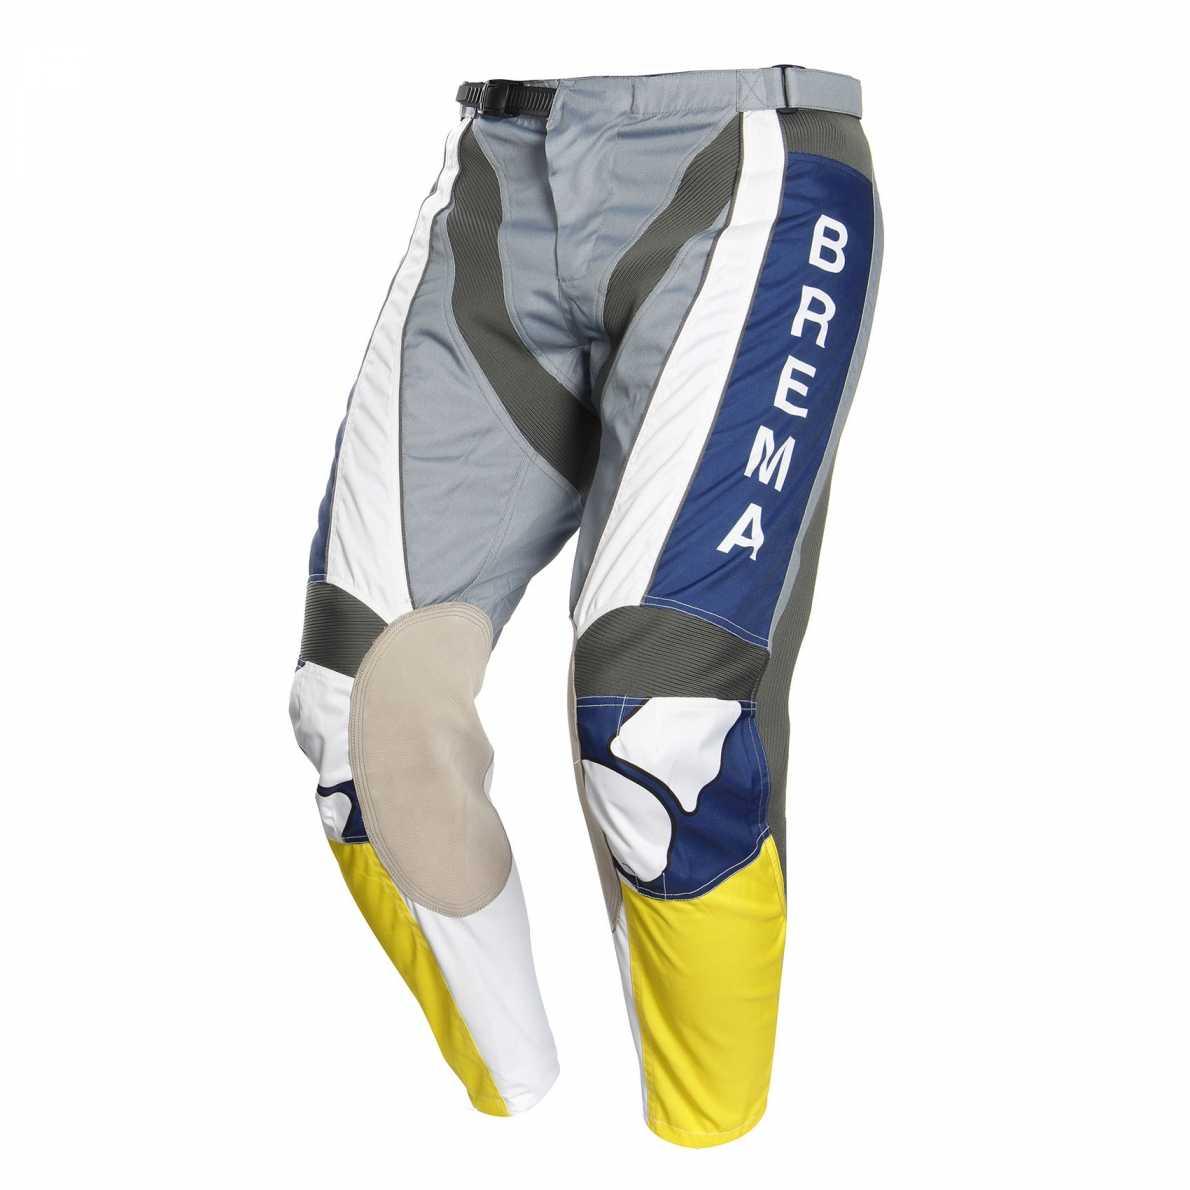 Pantalon BREMA Troféo. Crédits : ©accessoires-moto-enduro-cross.fr 2016